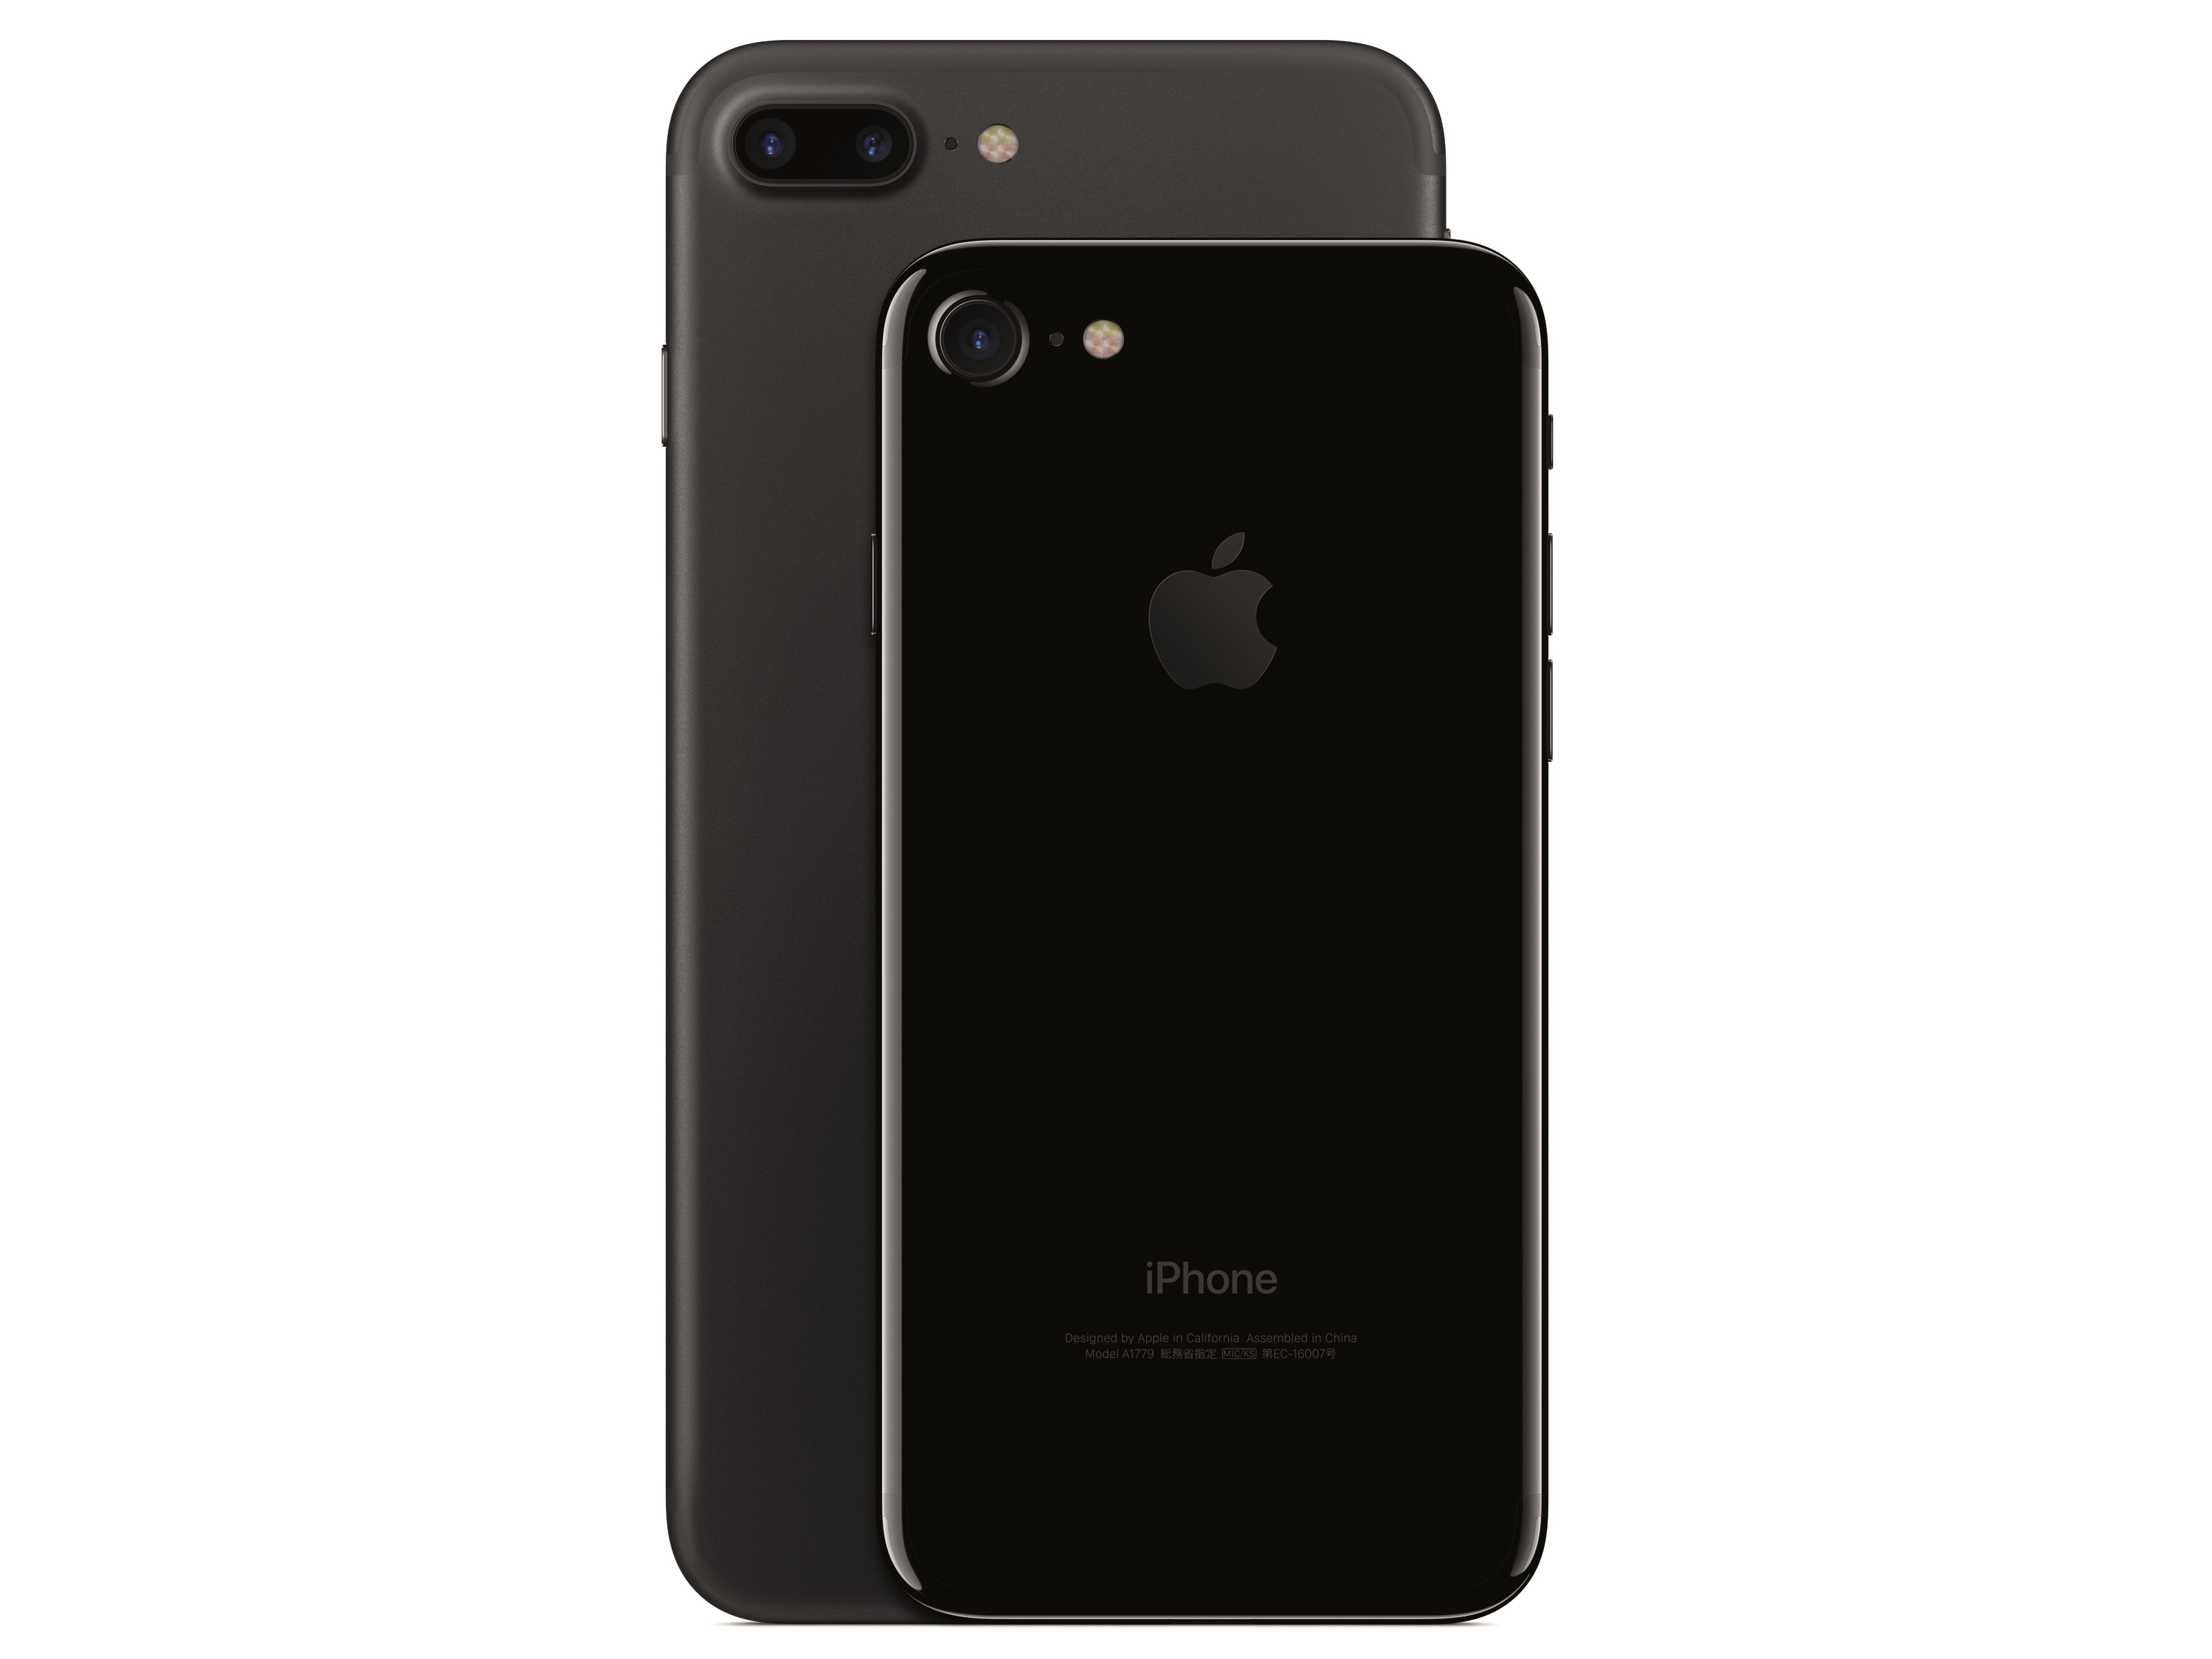 iphone-7-jet-black-on-iphone-7-plus-black